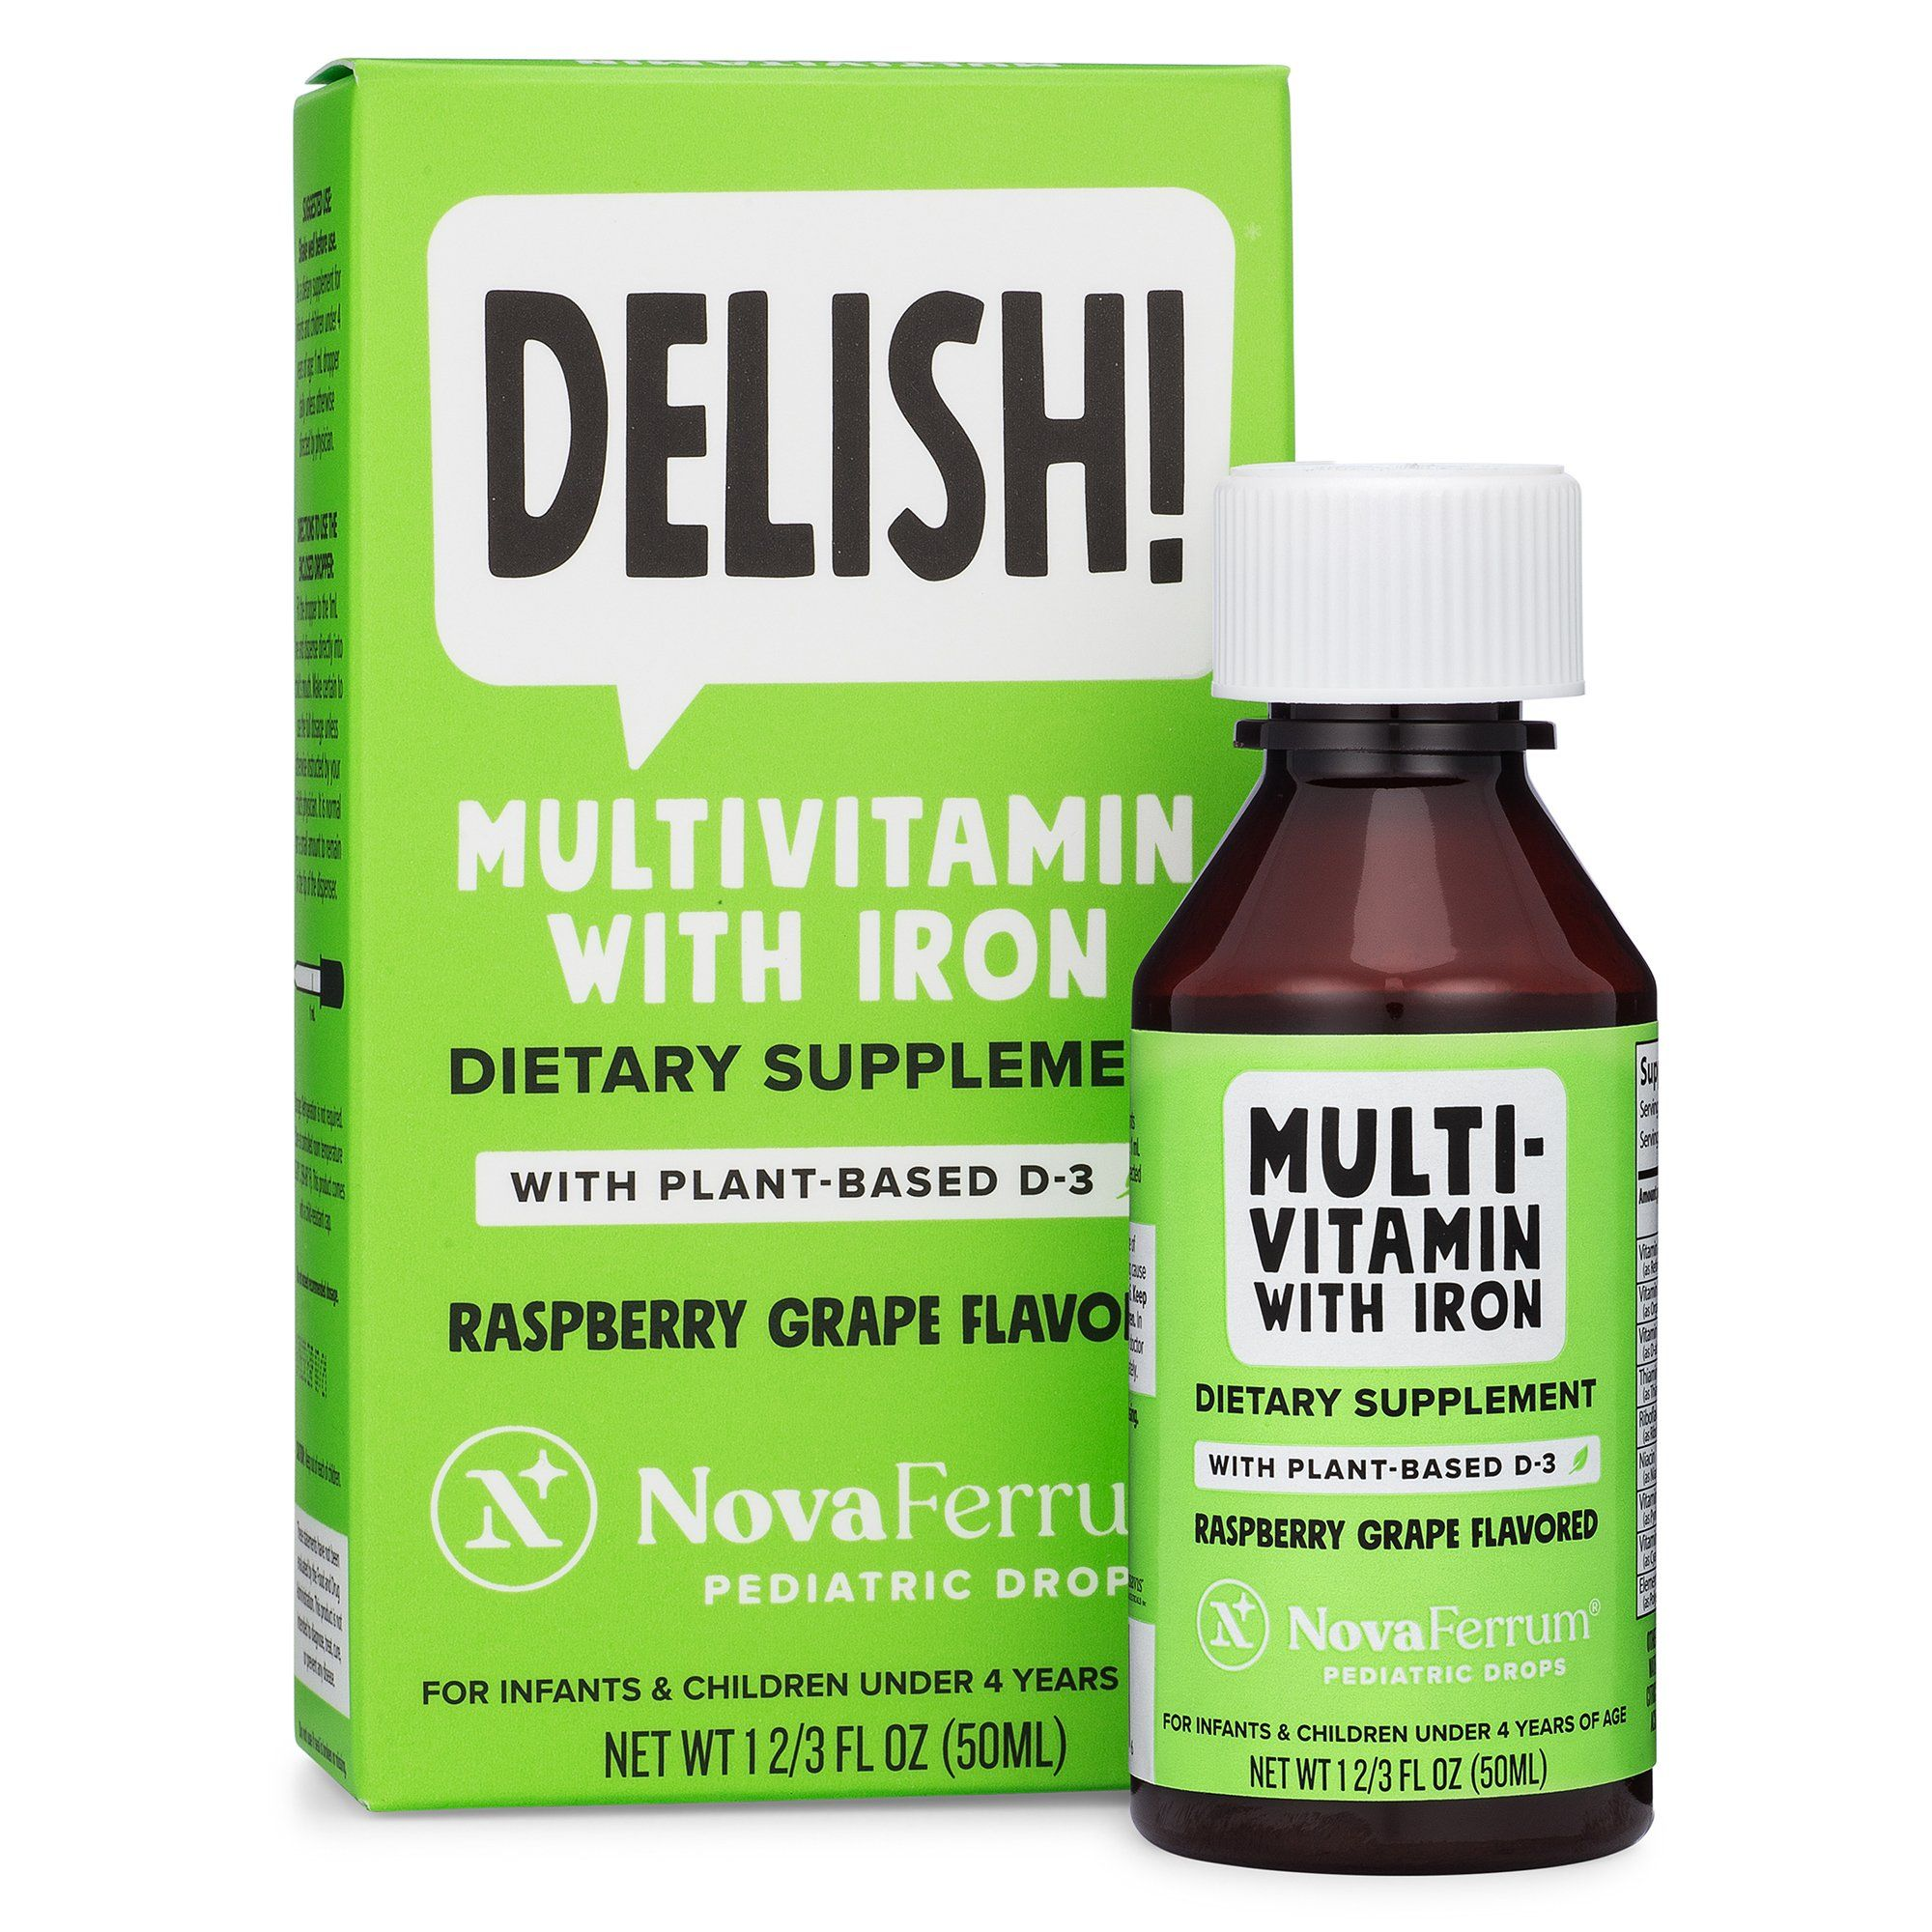 Novaferrum Vegan Multivitamin With Iron Pediatric Drops Organic Plant Based D3 In 2020 Multivitamins With Iron Plant Based Sugar Free Alcohol